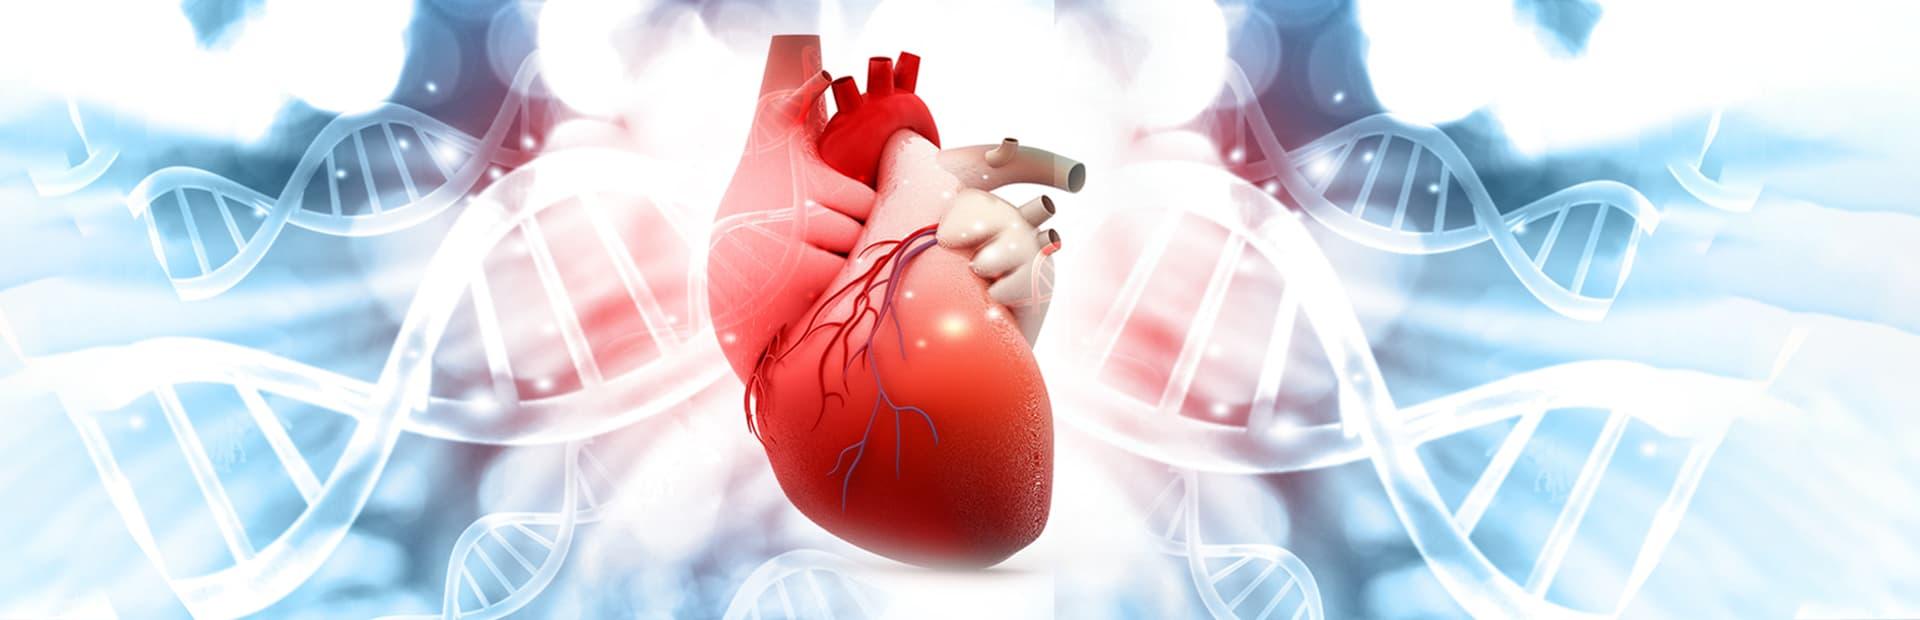 Chirurgie cardiothoracique